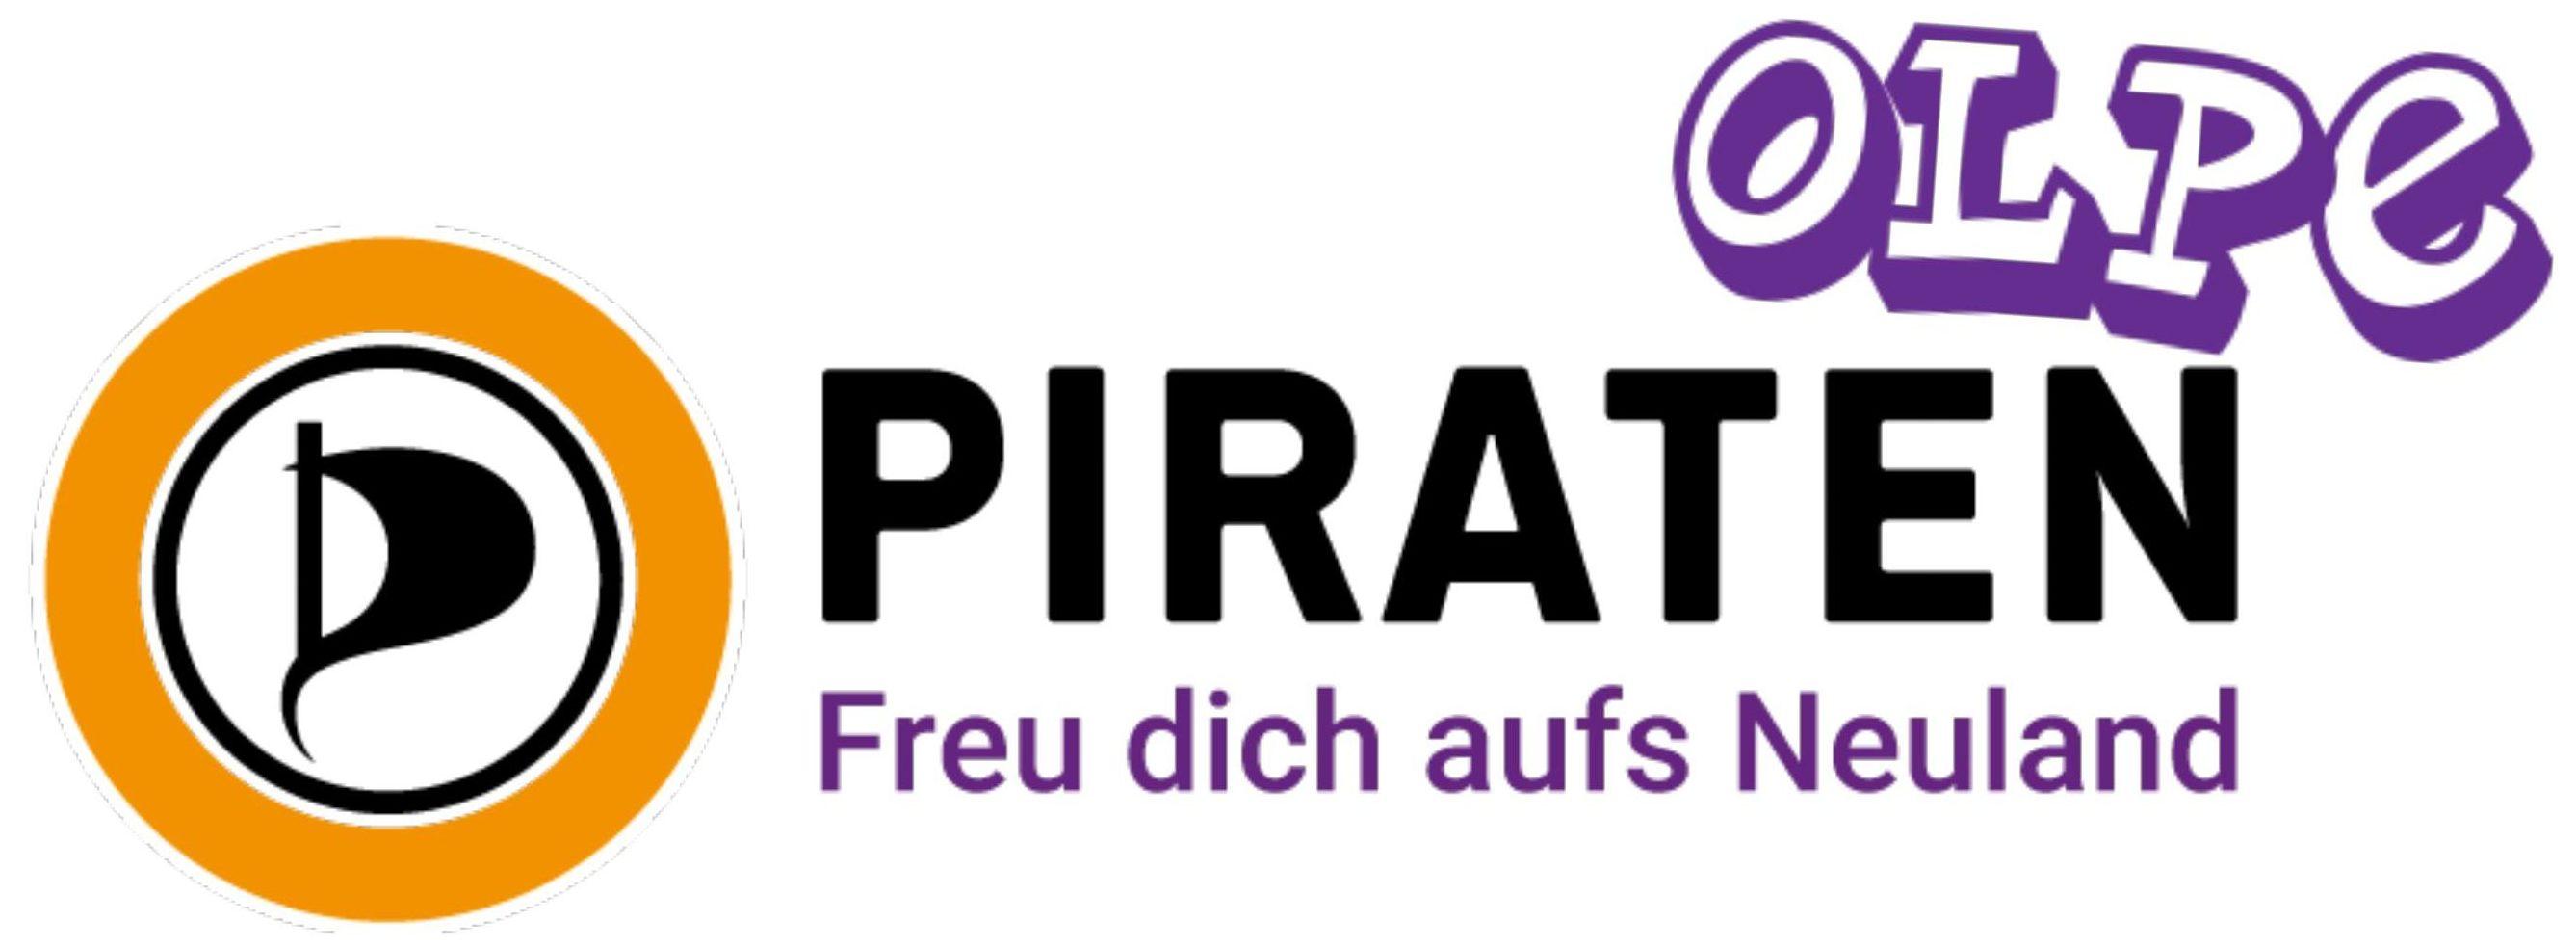 Piratenpartei Olpe